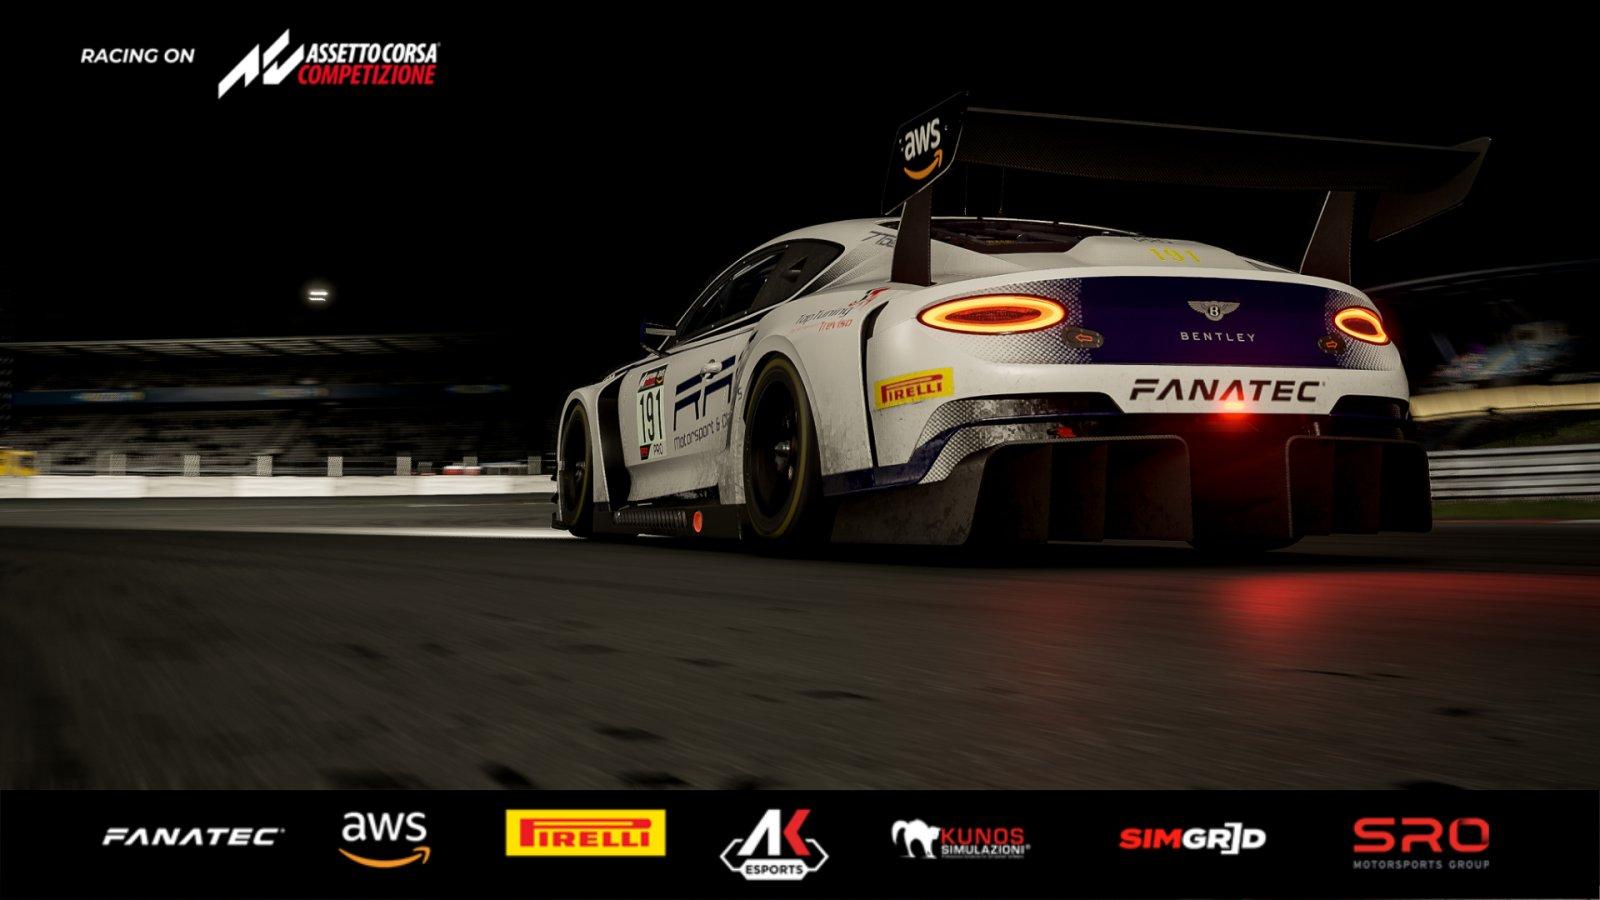 ESPORTS: Racing Line Motorsport secures sensational comeback victory in Endurance Series thriller at the Nürburgring